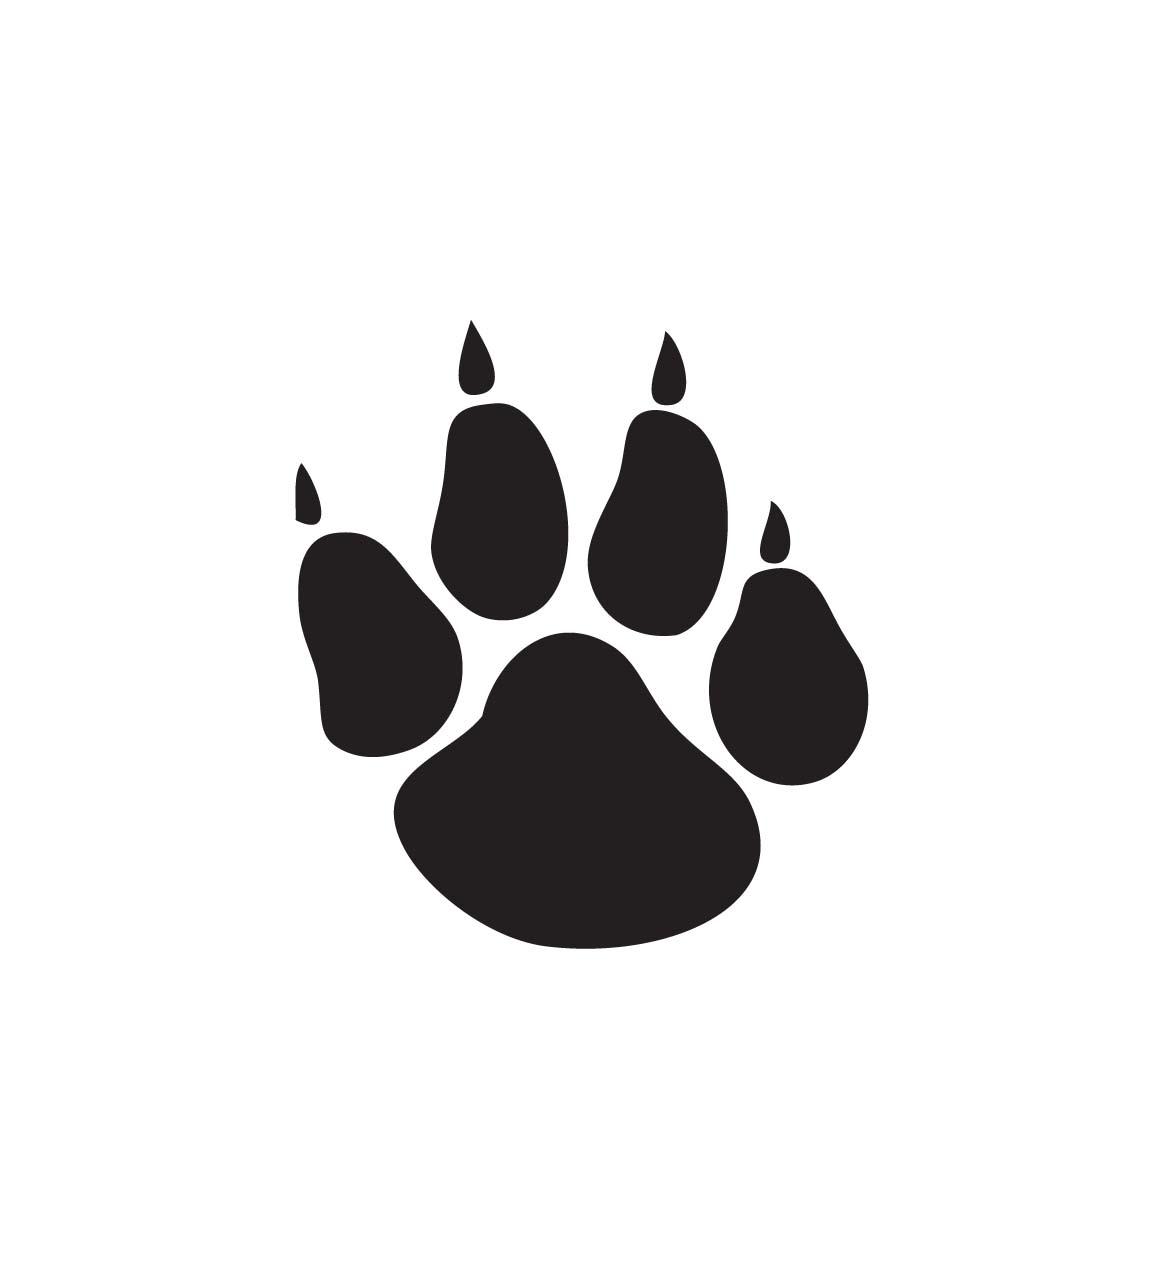 1174x1282 Dog Paw Prints Free Dog Paw Print Clip Art Library